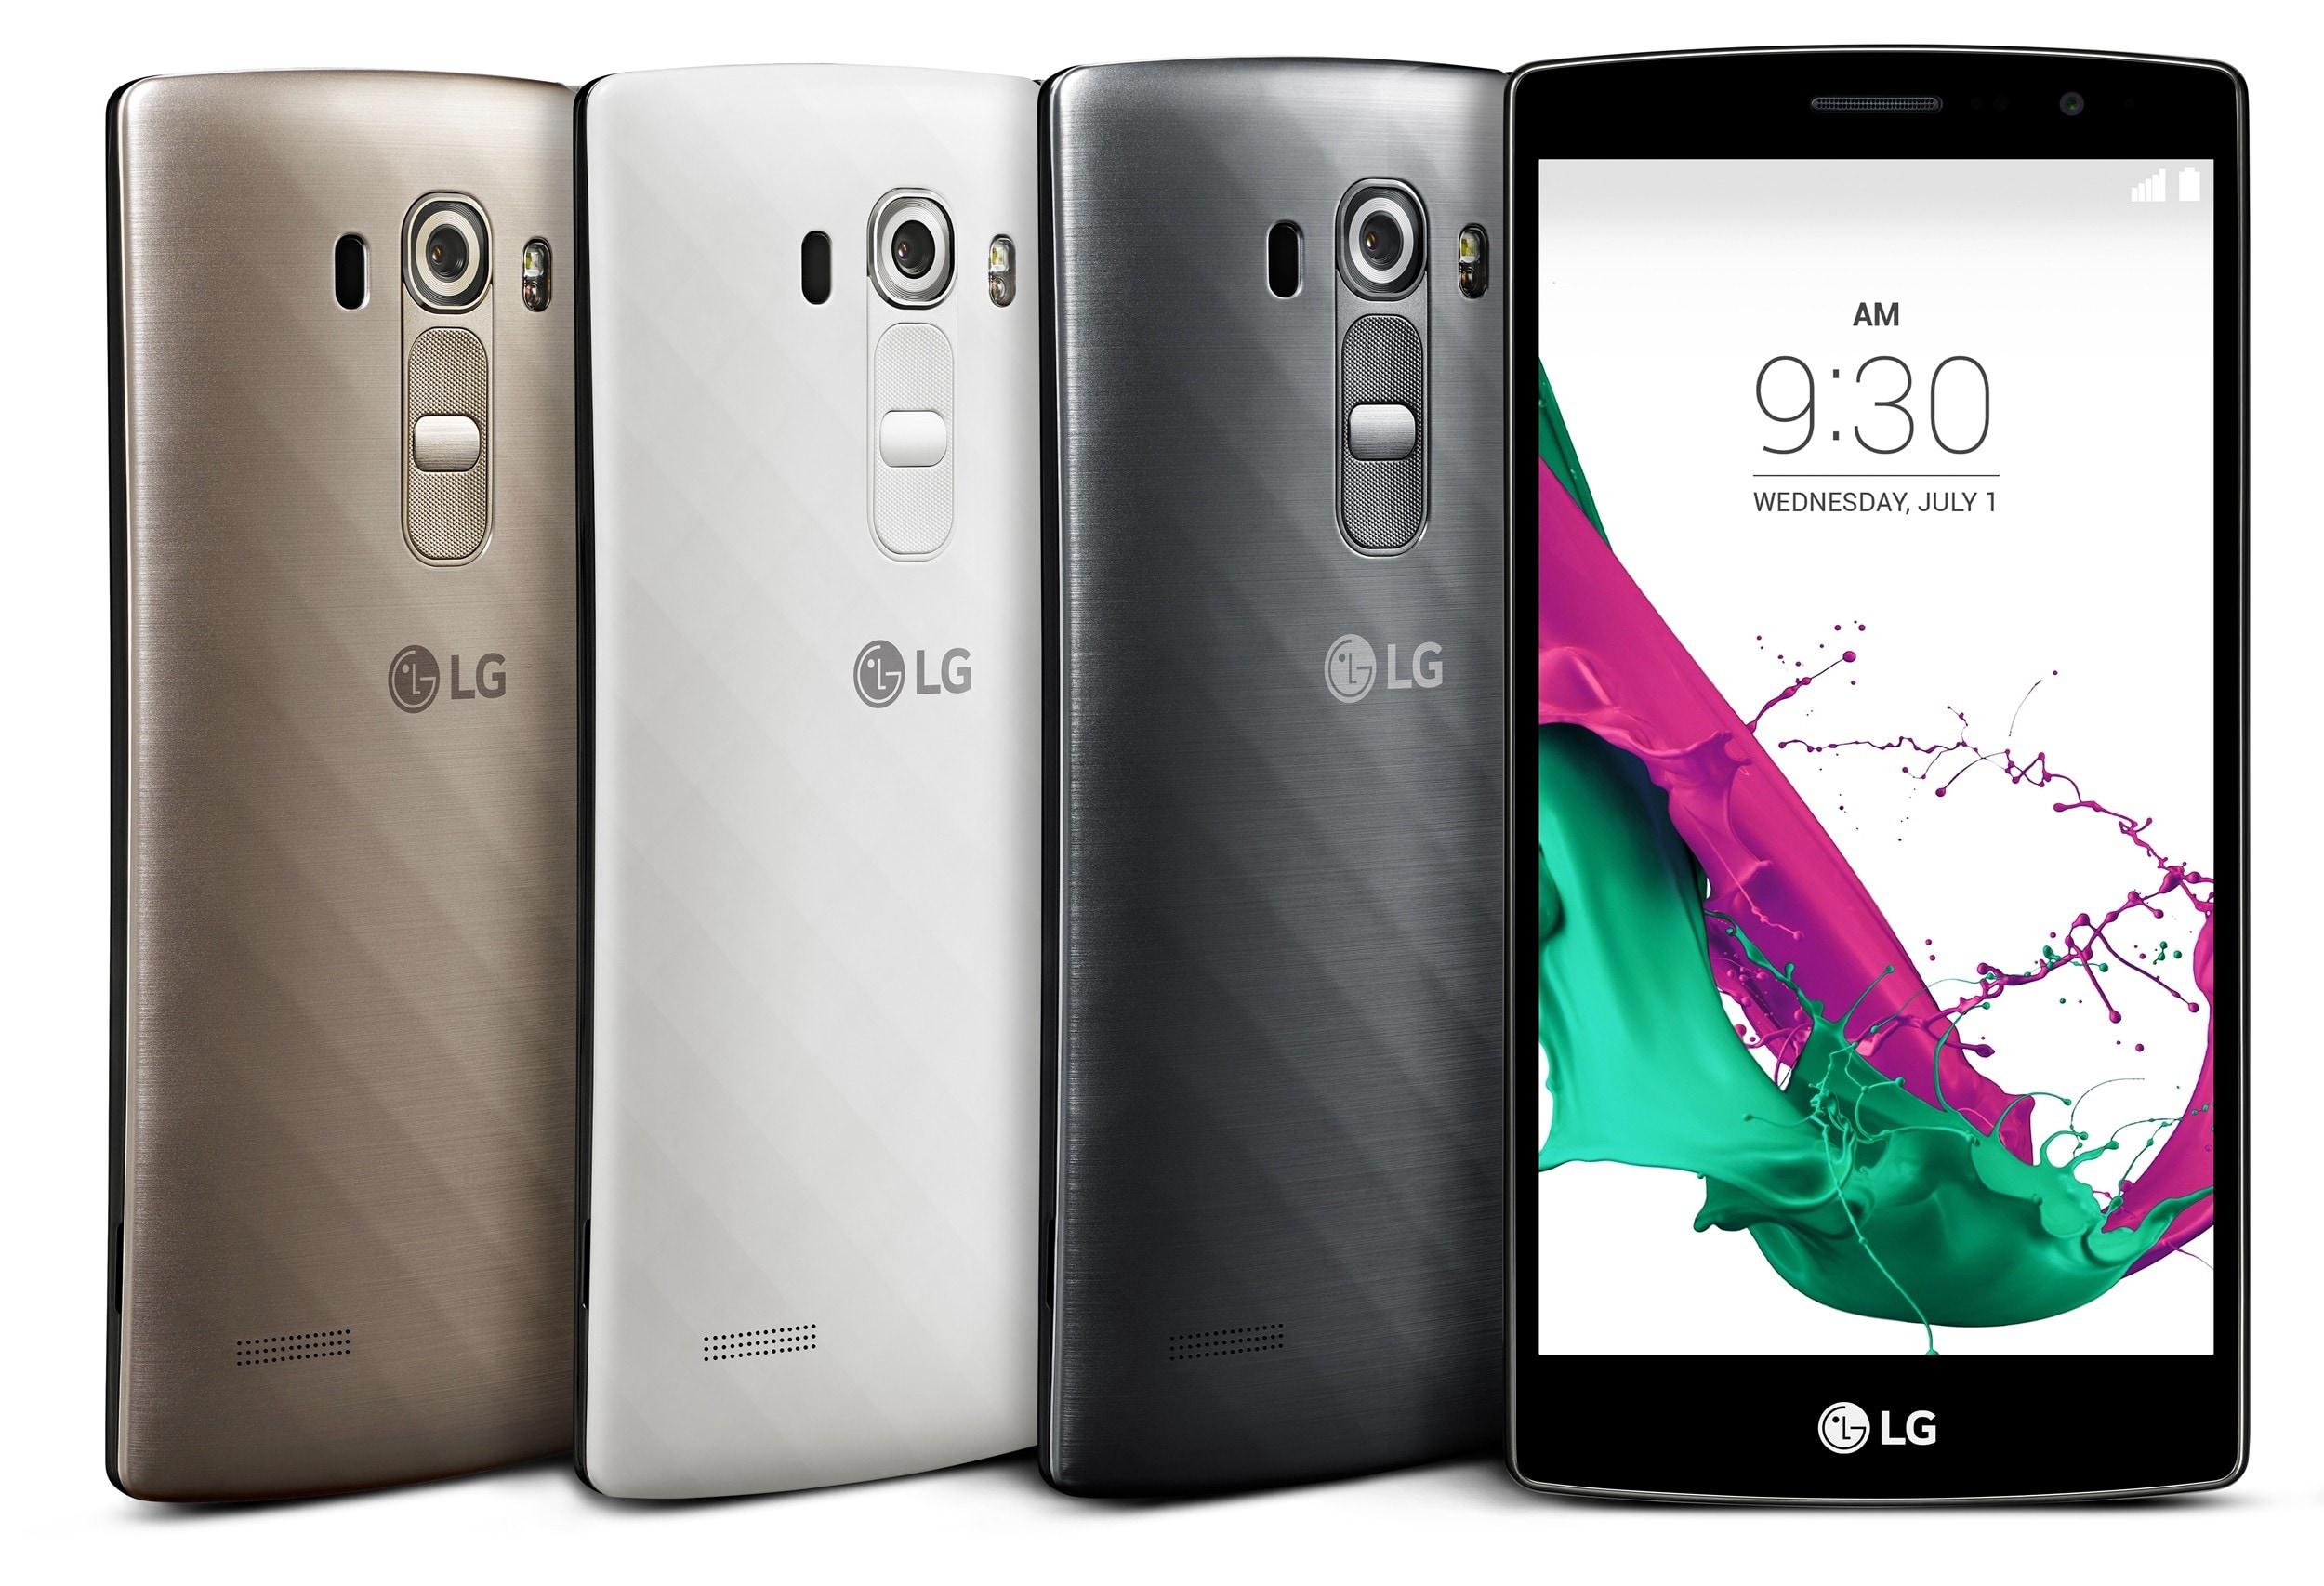 LG G4s render – 2